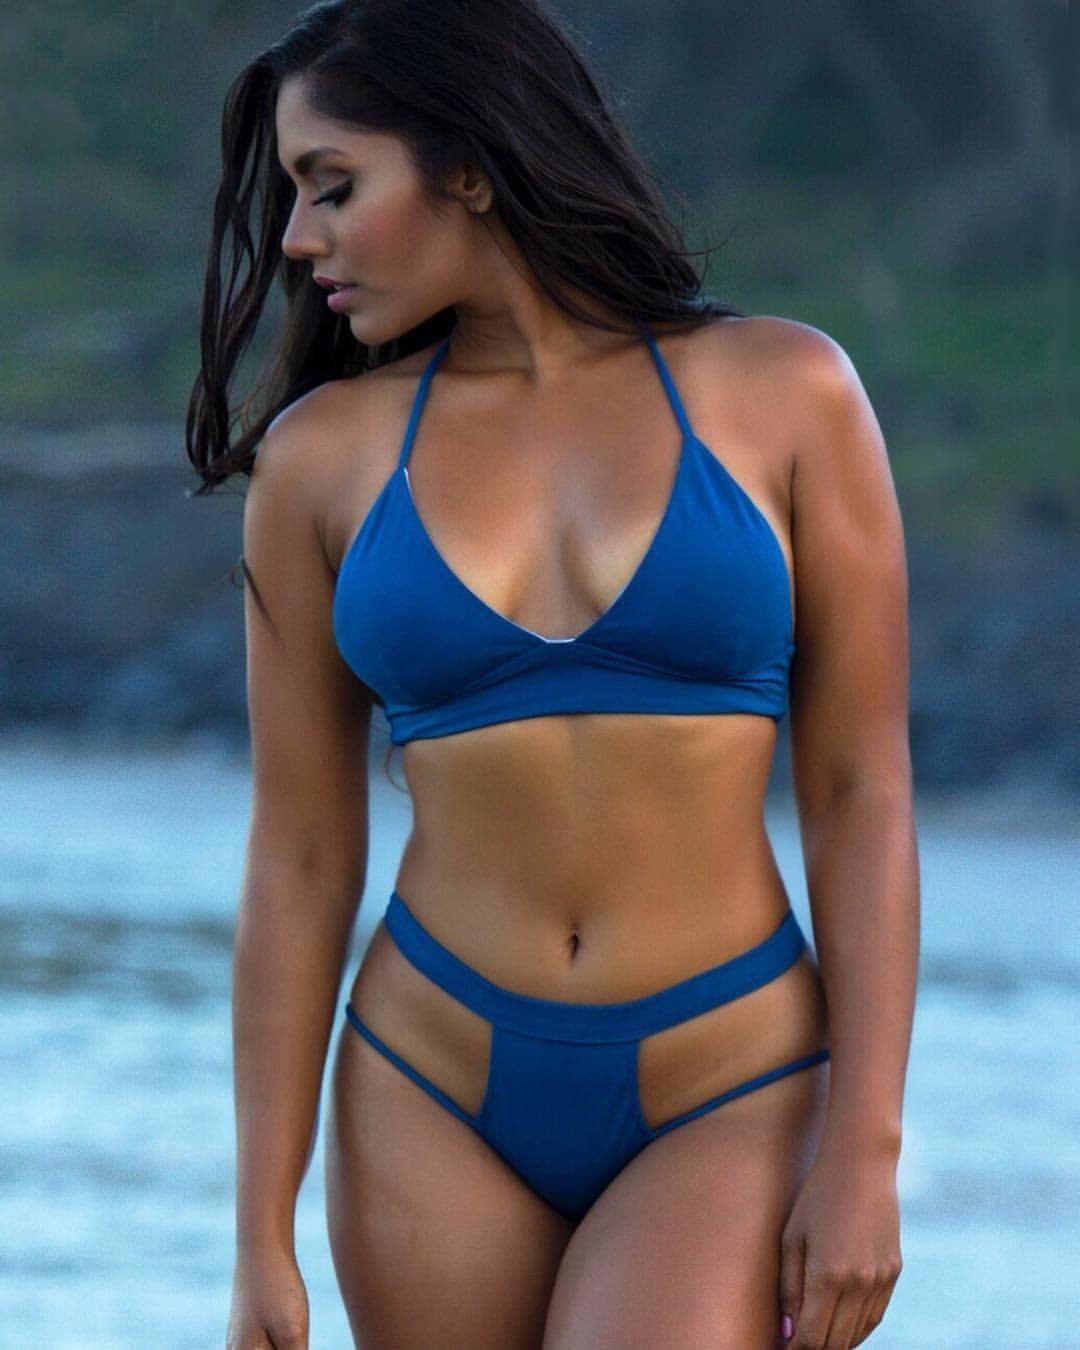 Watch Nina Dobrev Looking Thick In A Bikini video